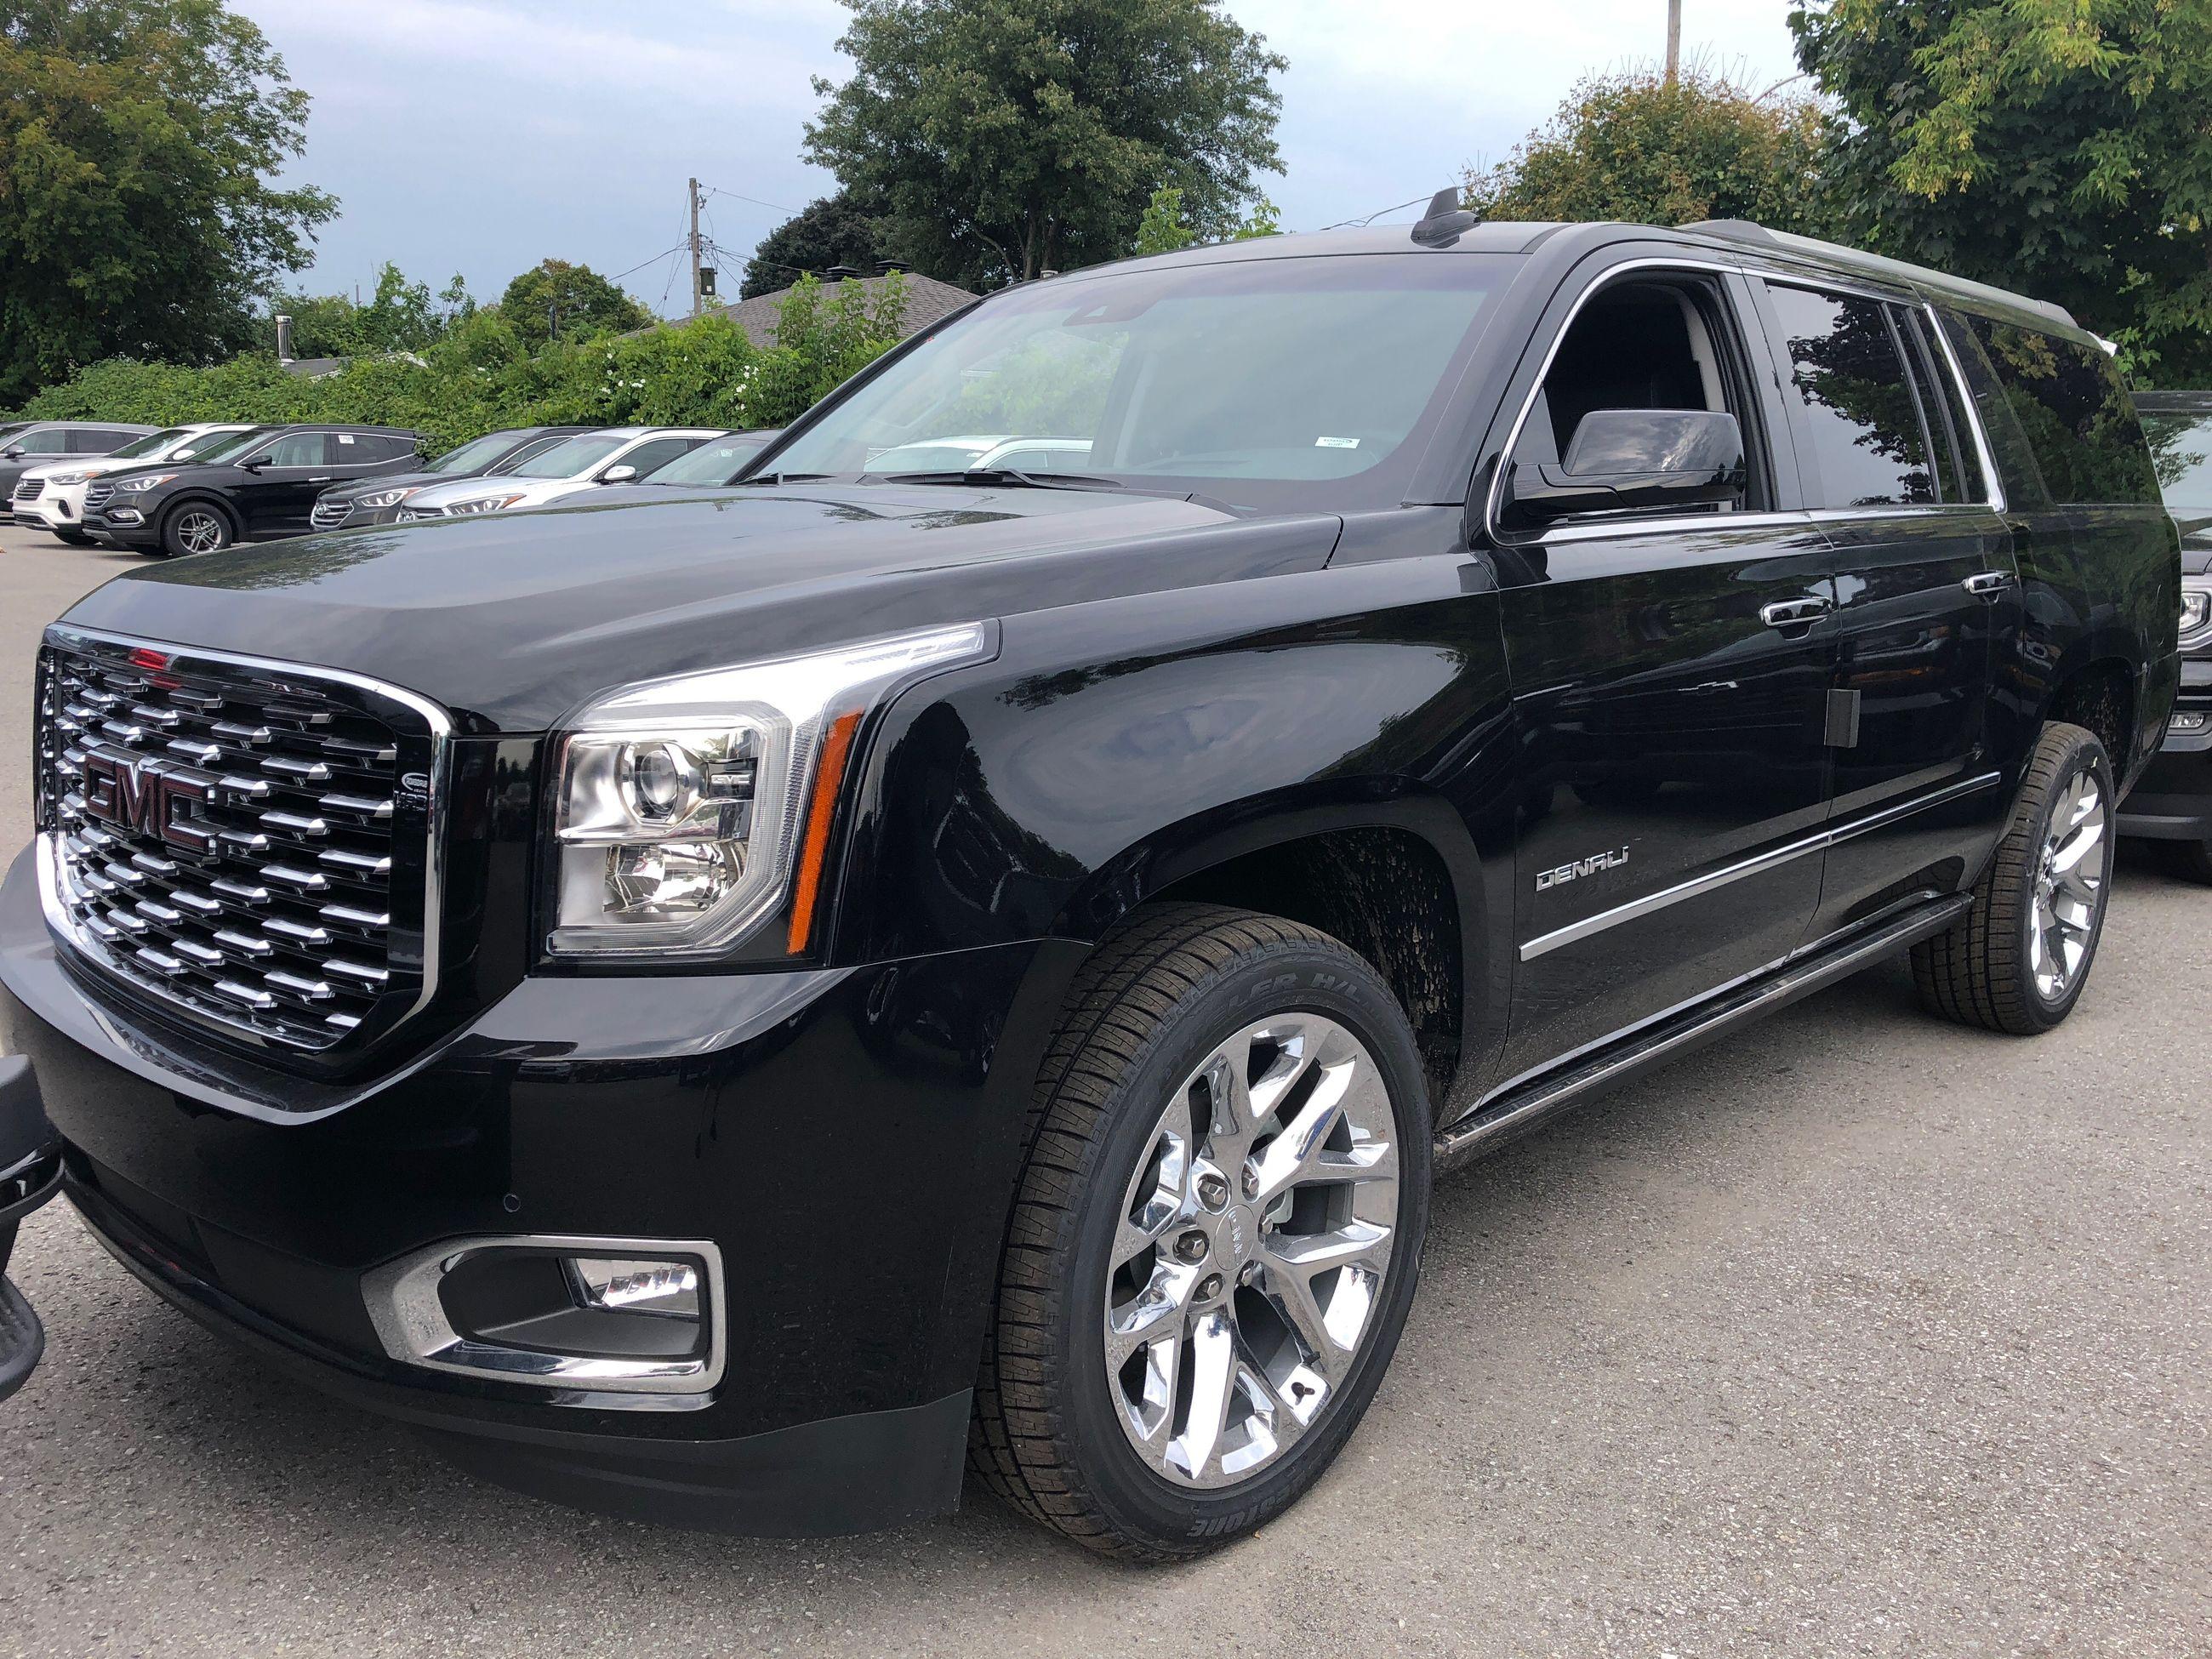 New 2019 GMC Yukon XL DENALI for Sale - $93739.0 ...